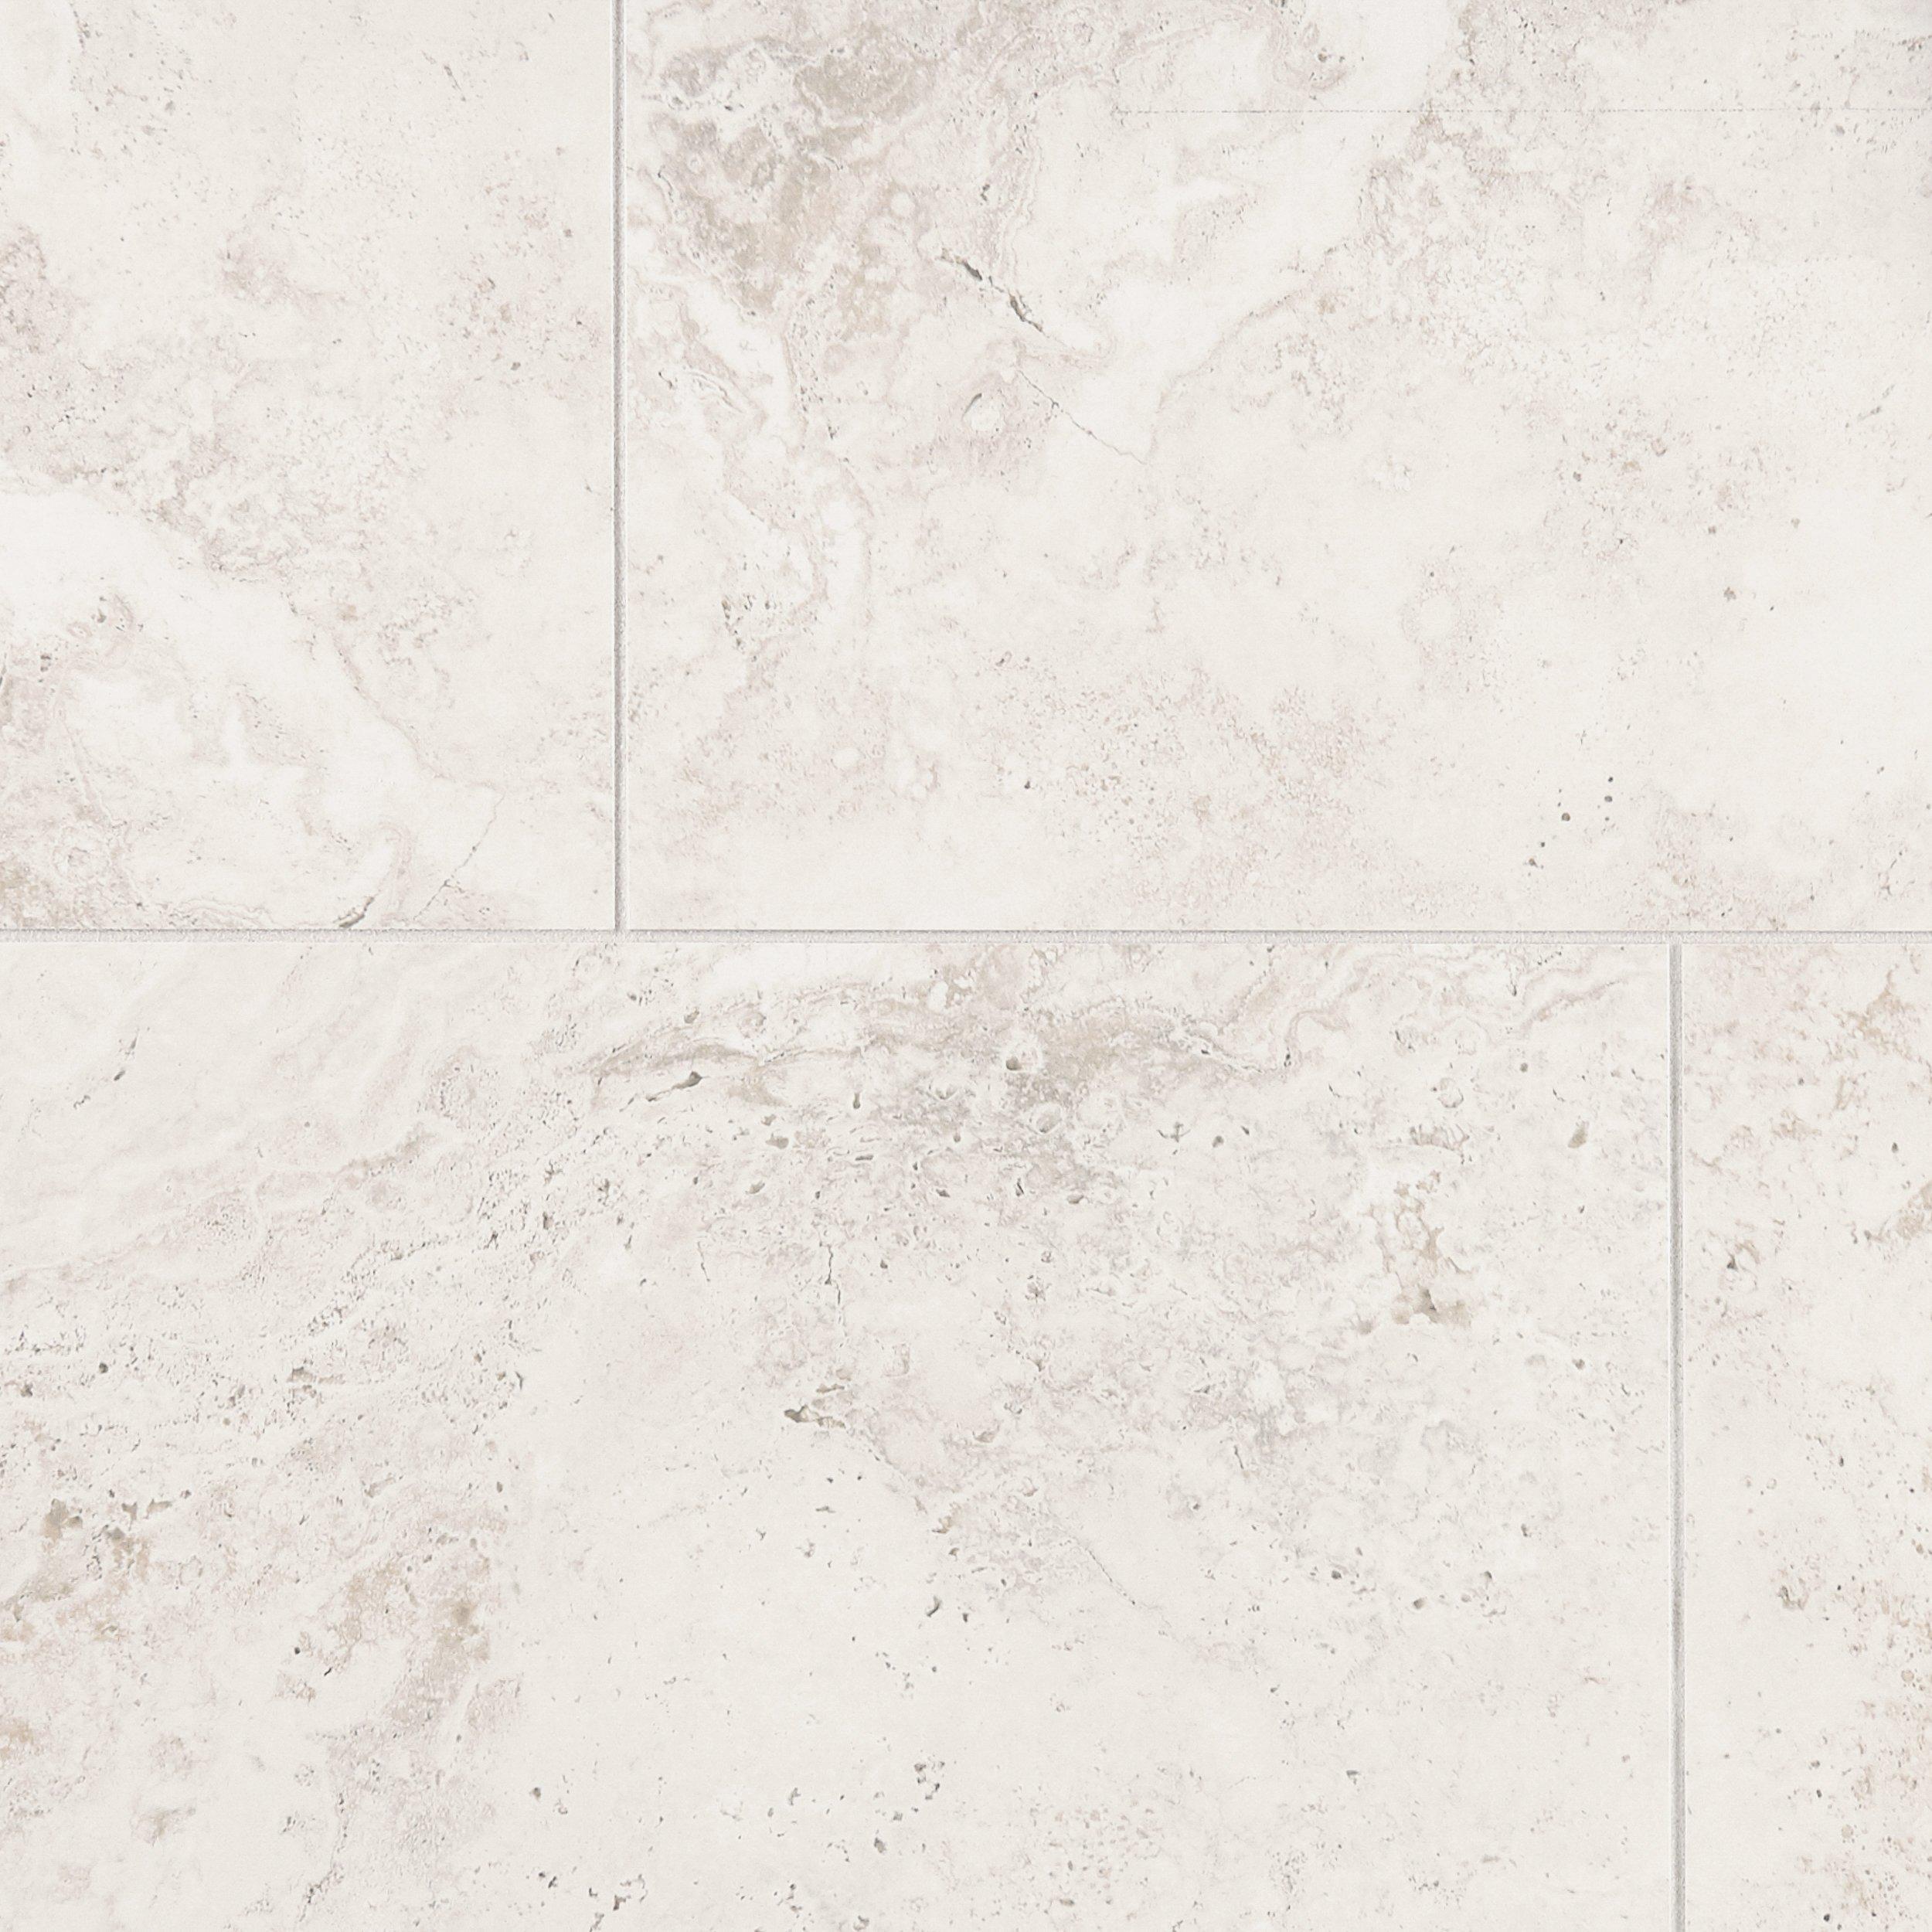 Tile bathroom floor decor tarsus matte almond porcelain tile dailygadgetfo Image collections